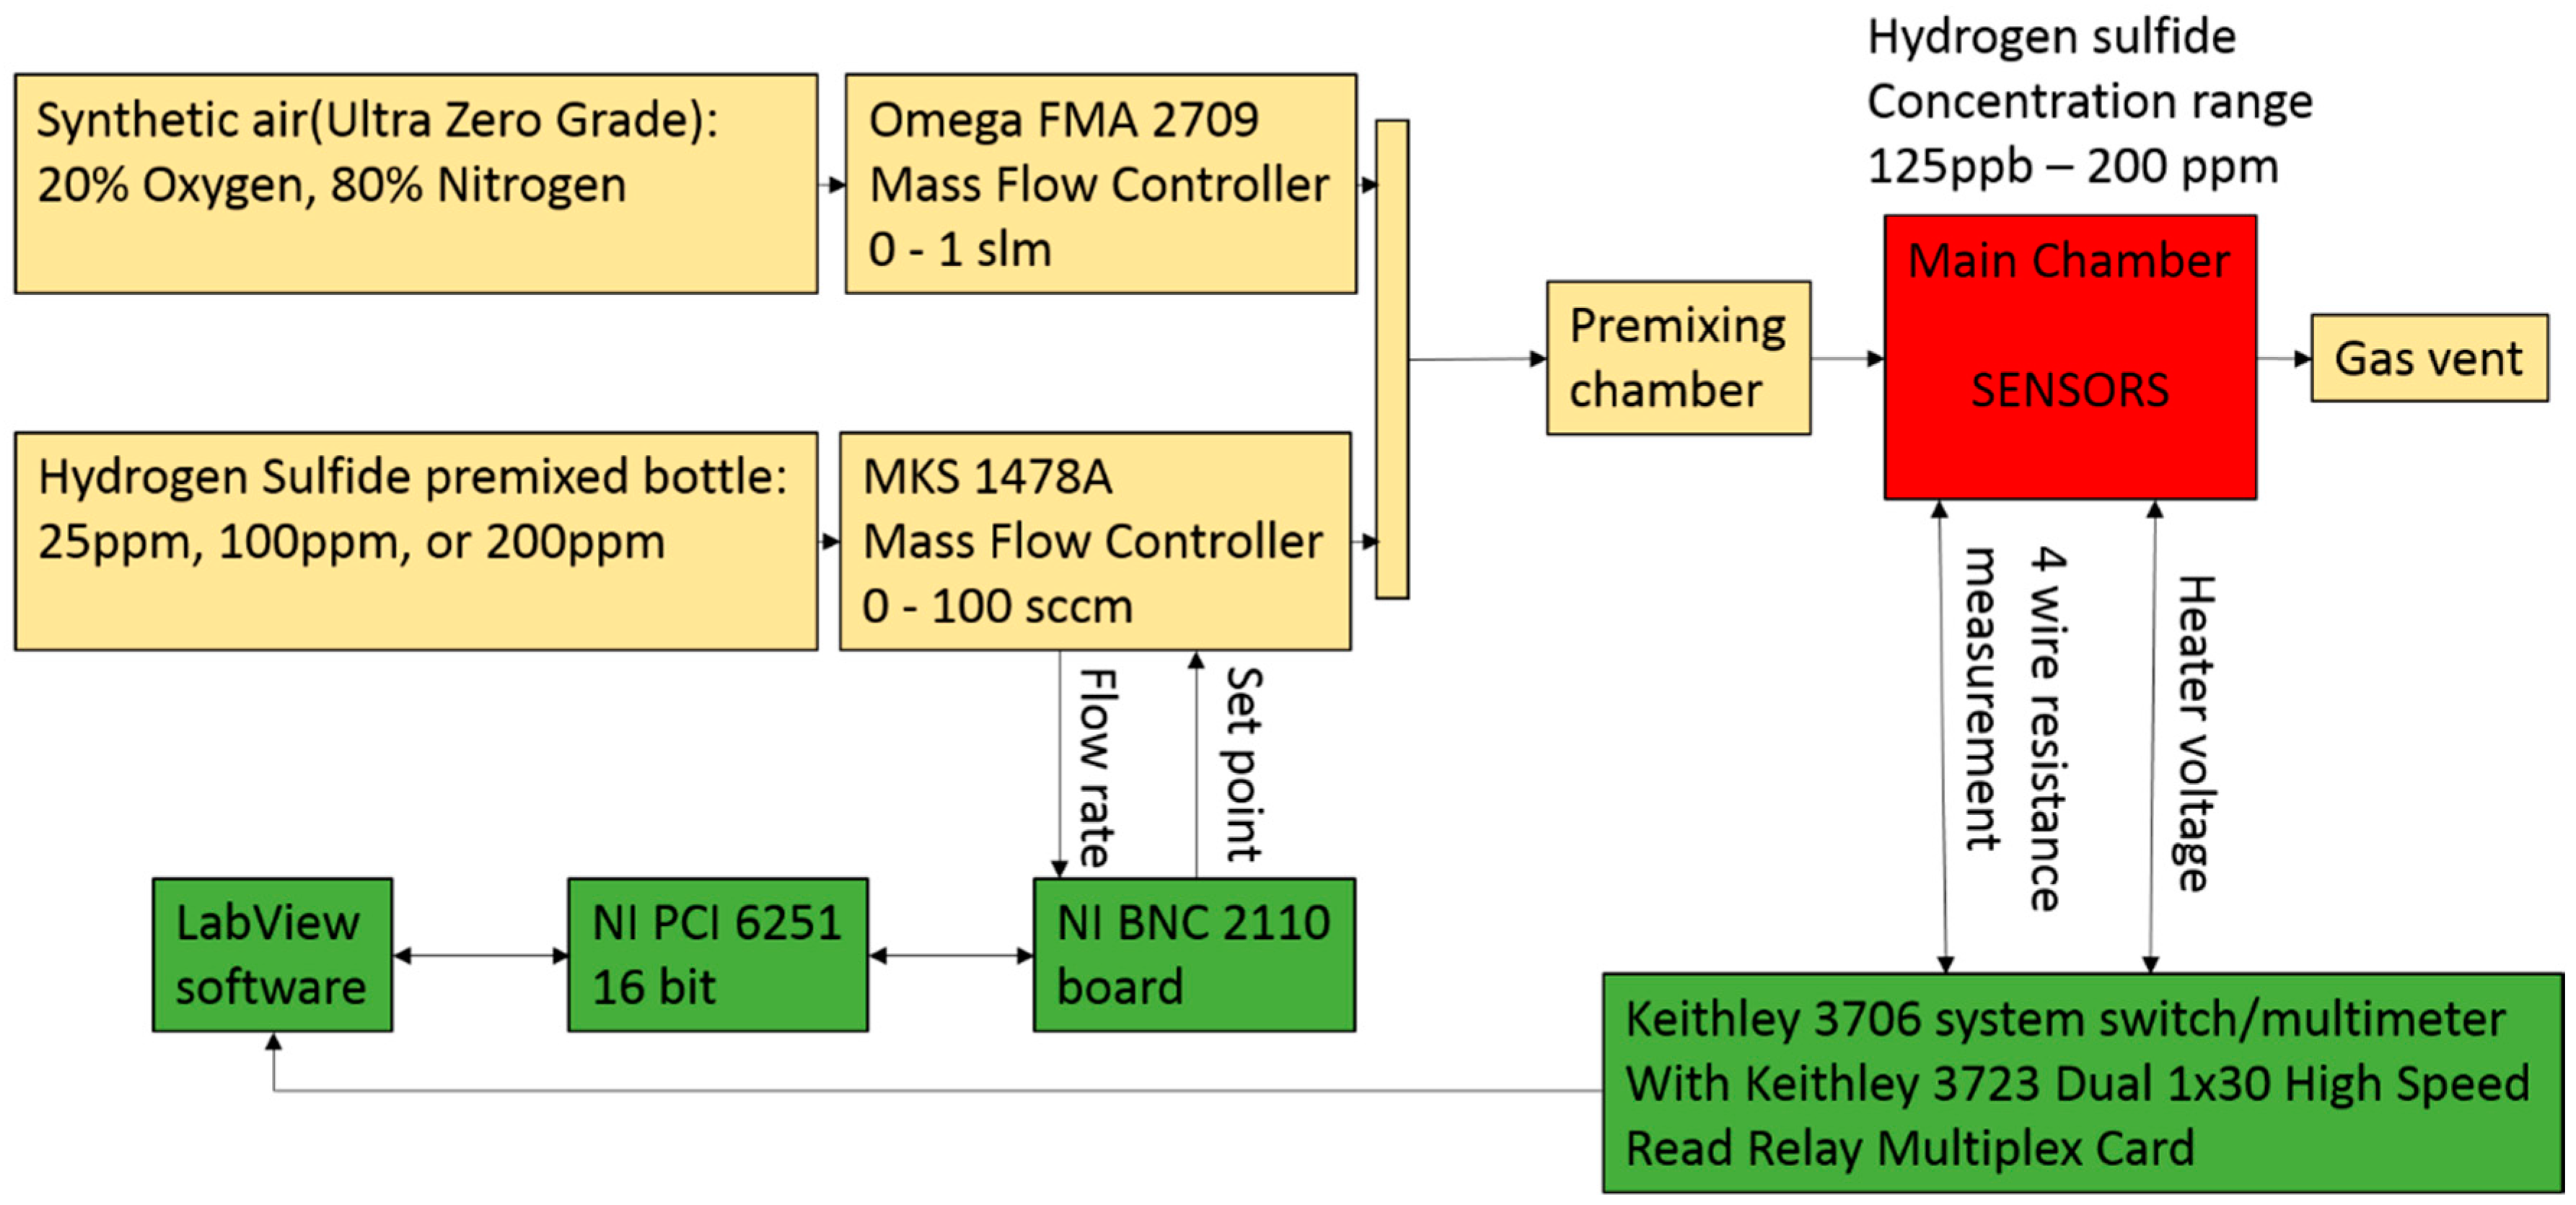 hydrogen concentration sensor selection for the